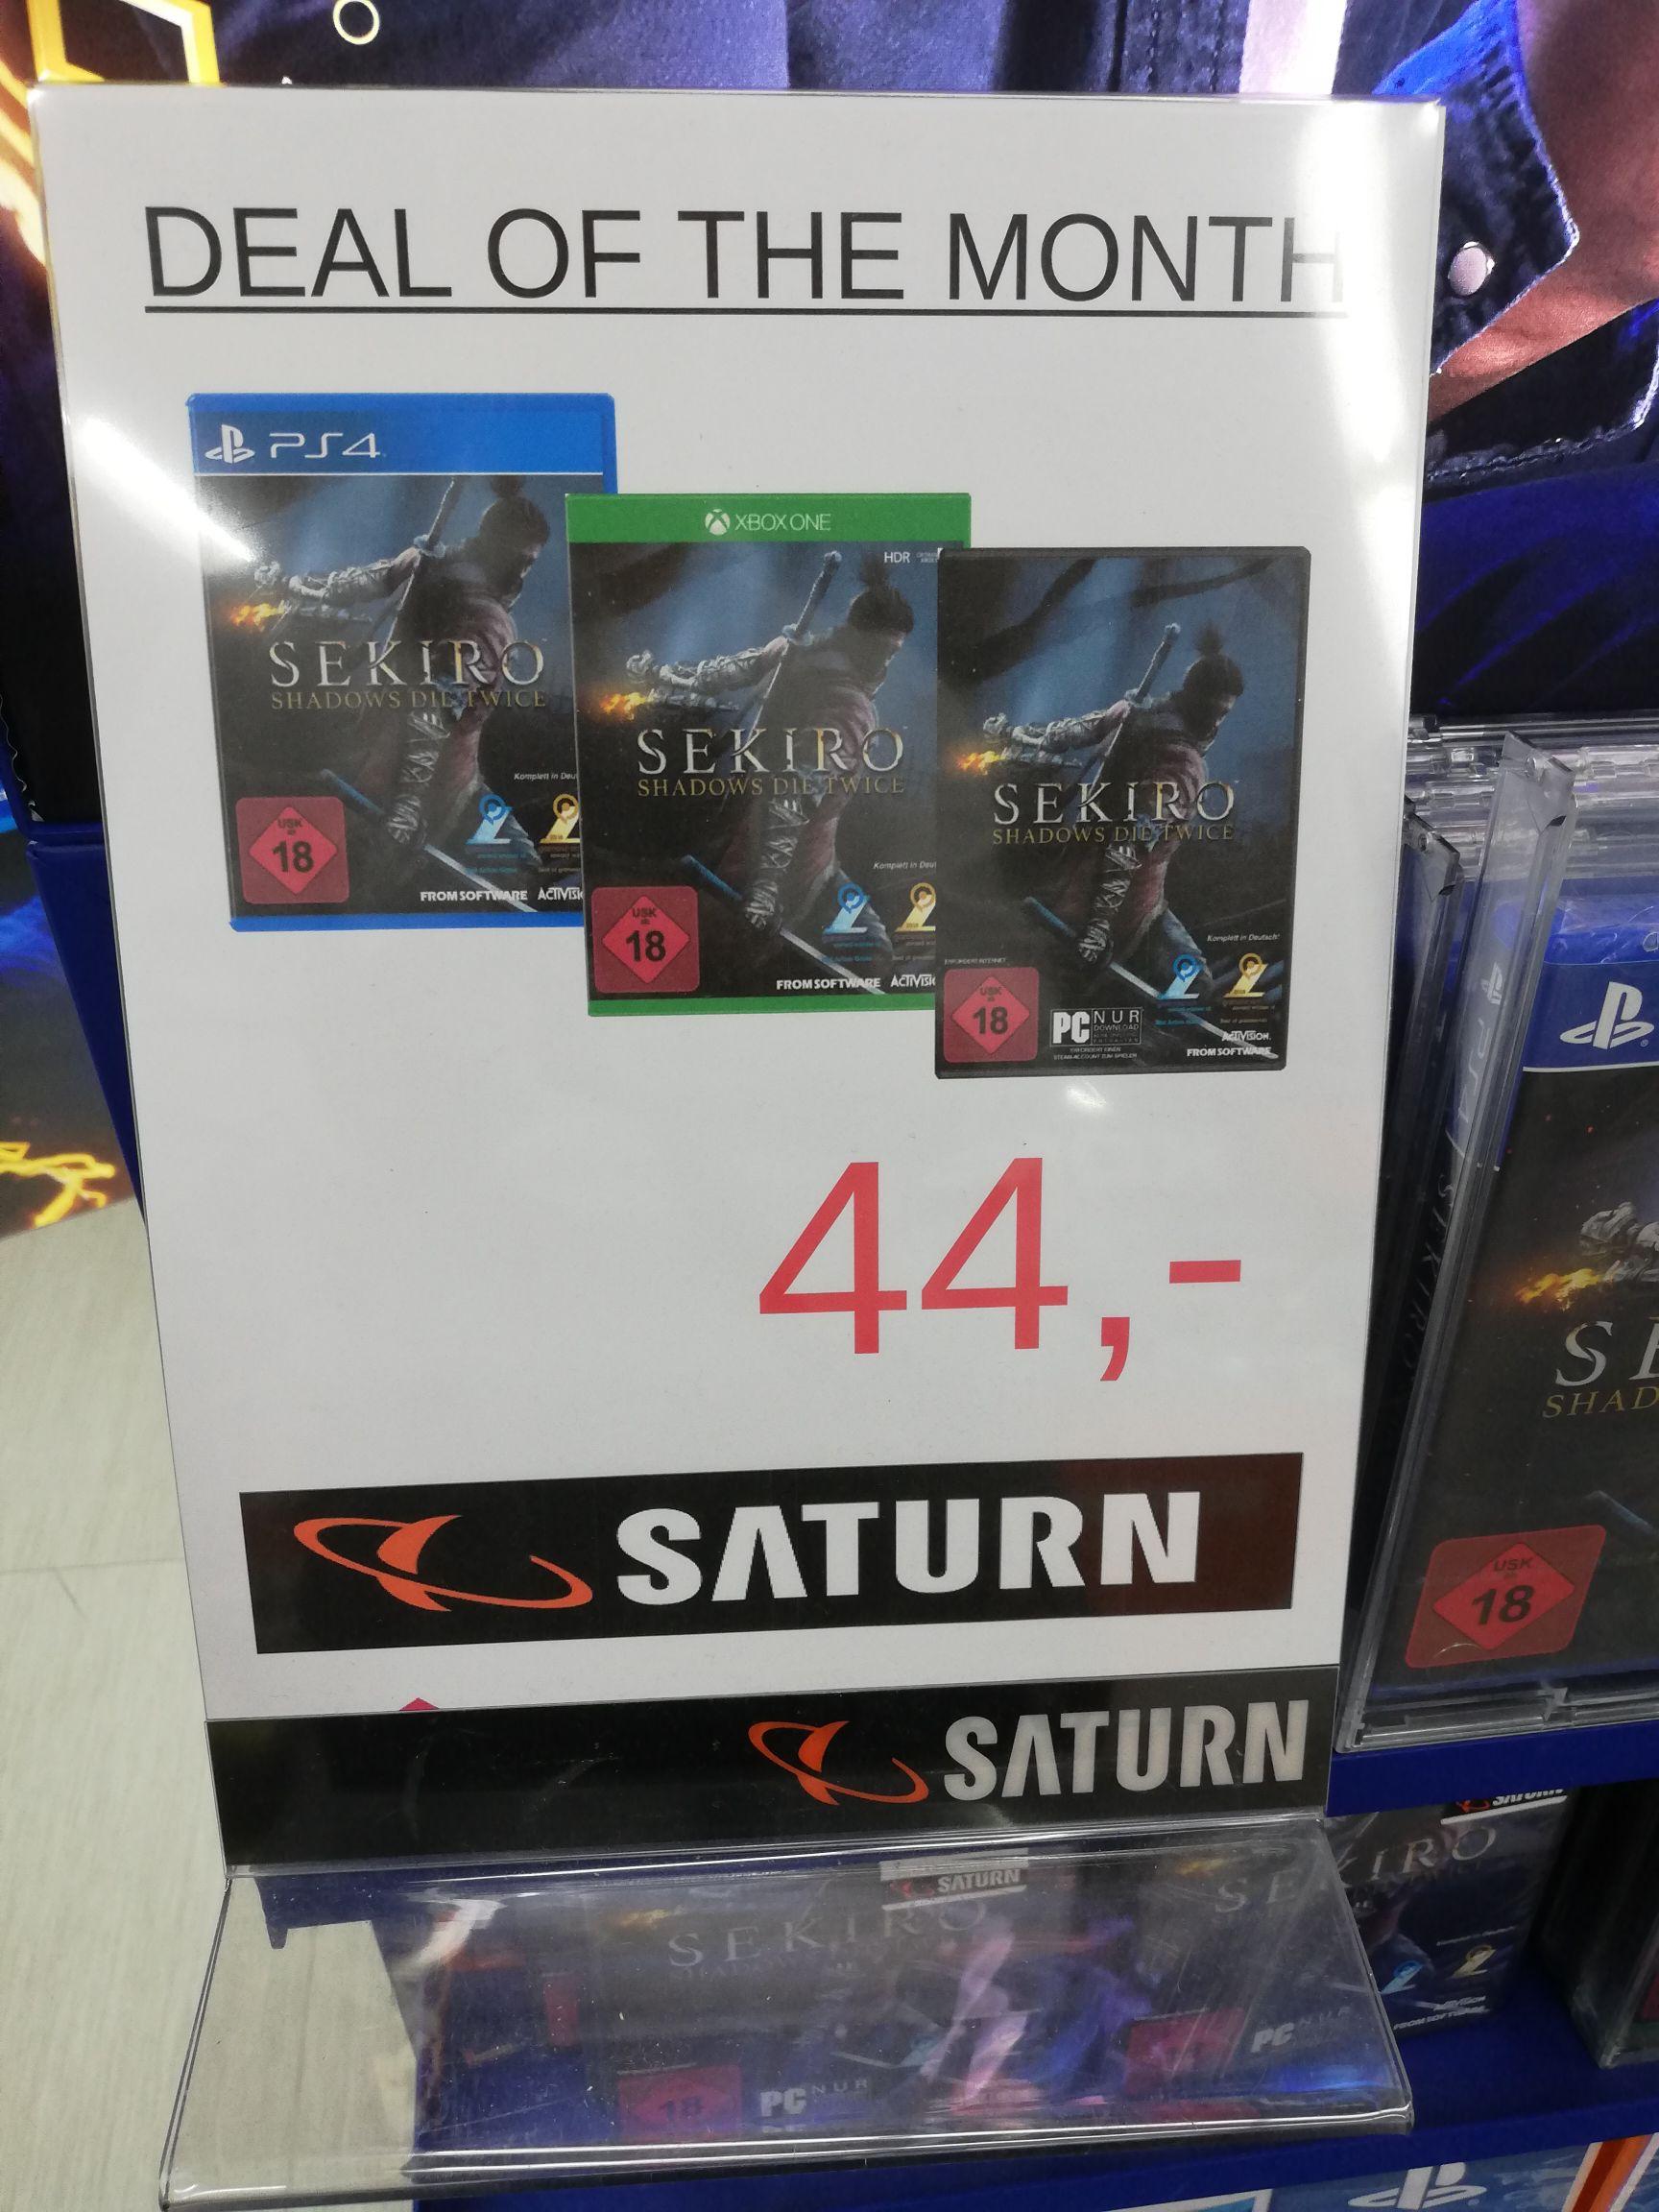 Lokal Saturn Europa Center Sekiro (PS4, XBOX ONE, PC)